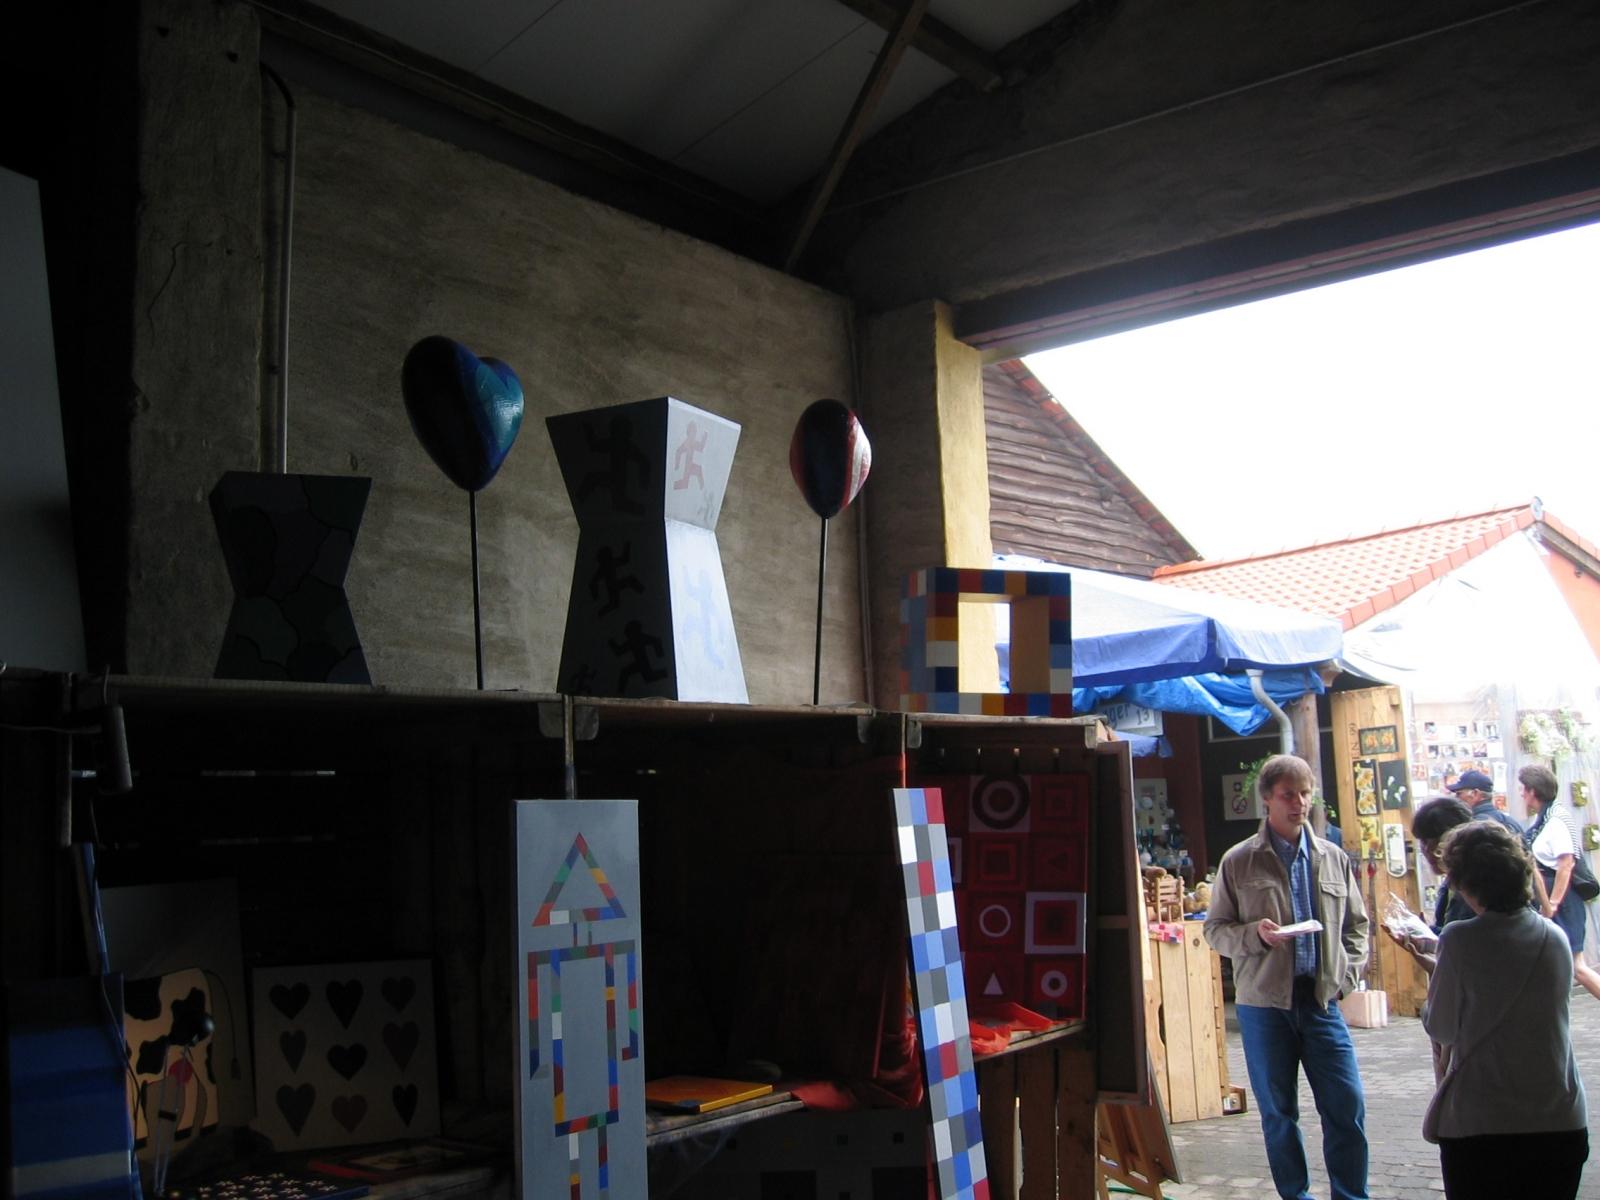 Busen galerie